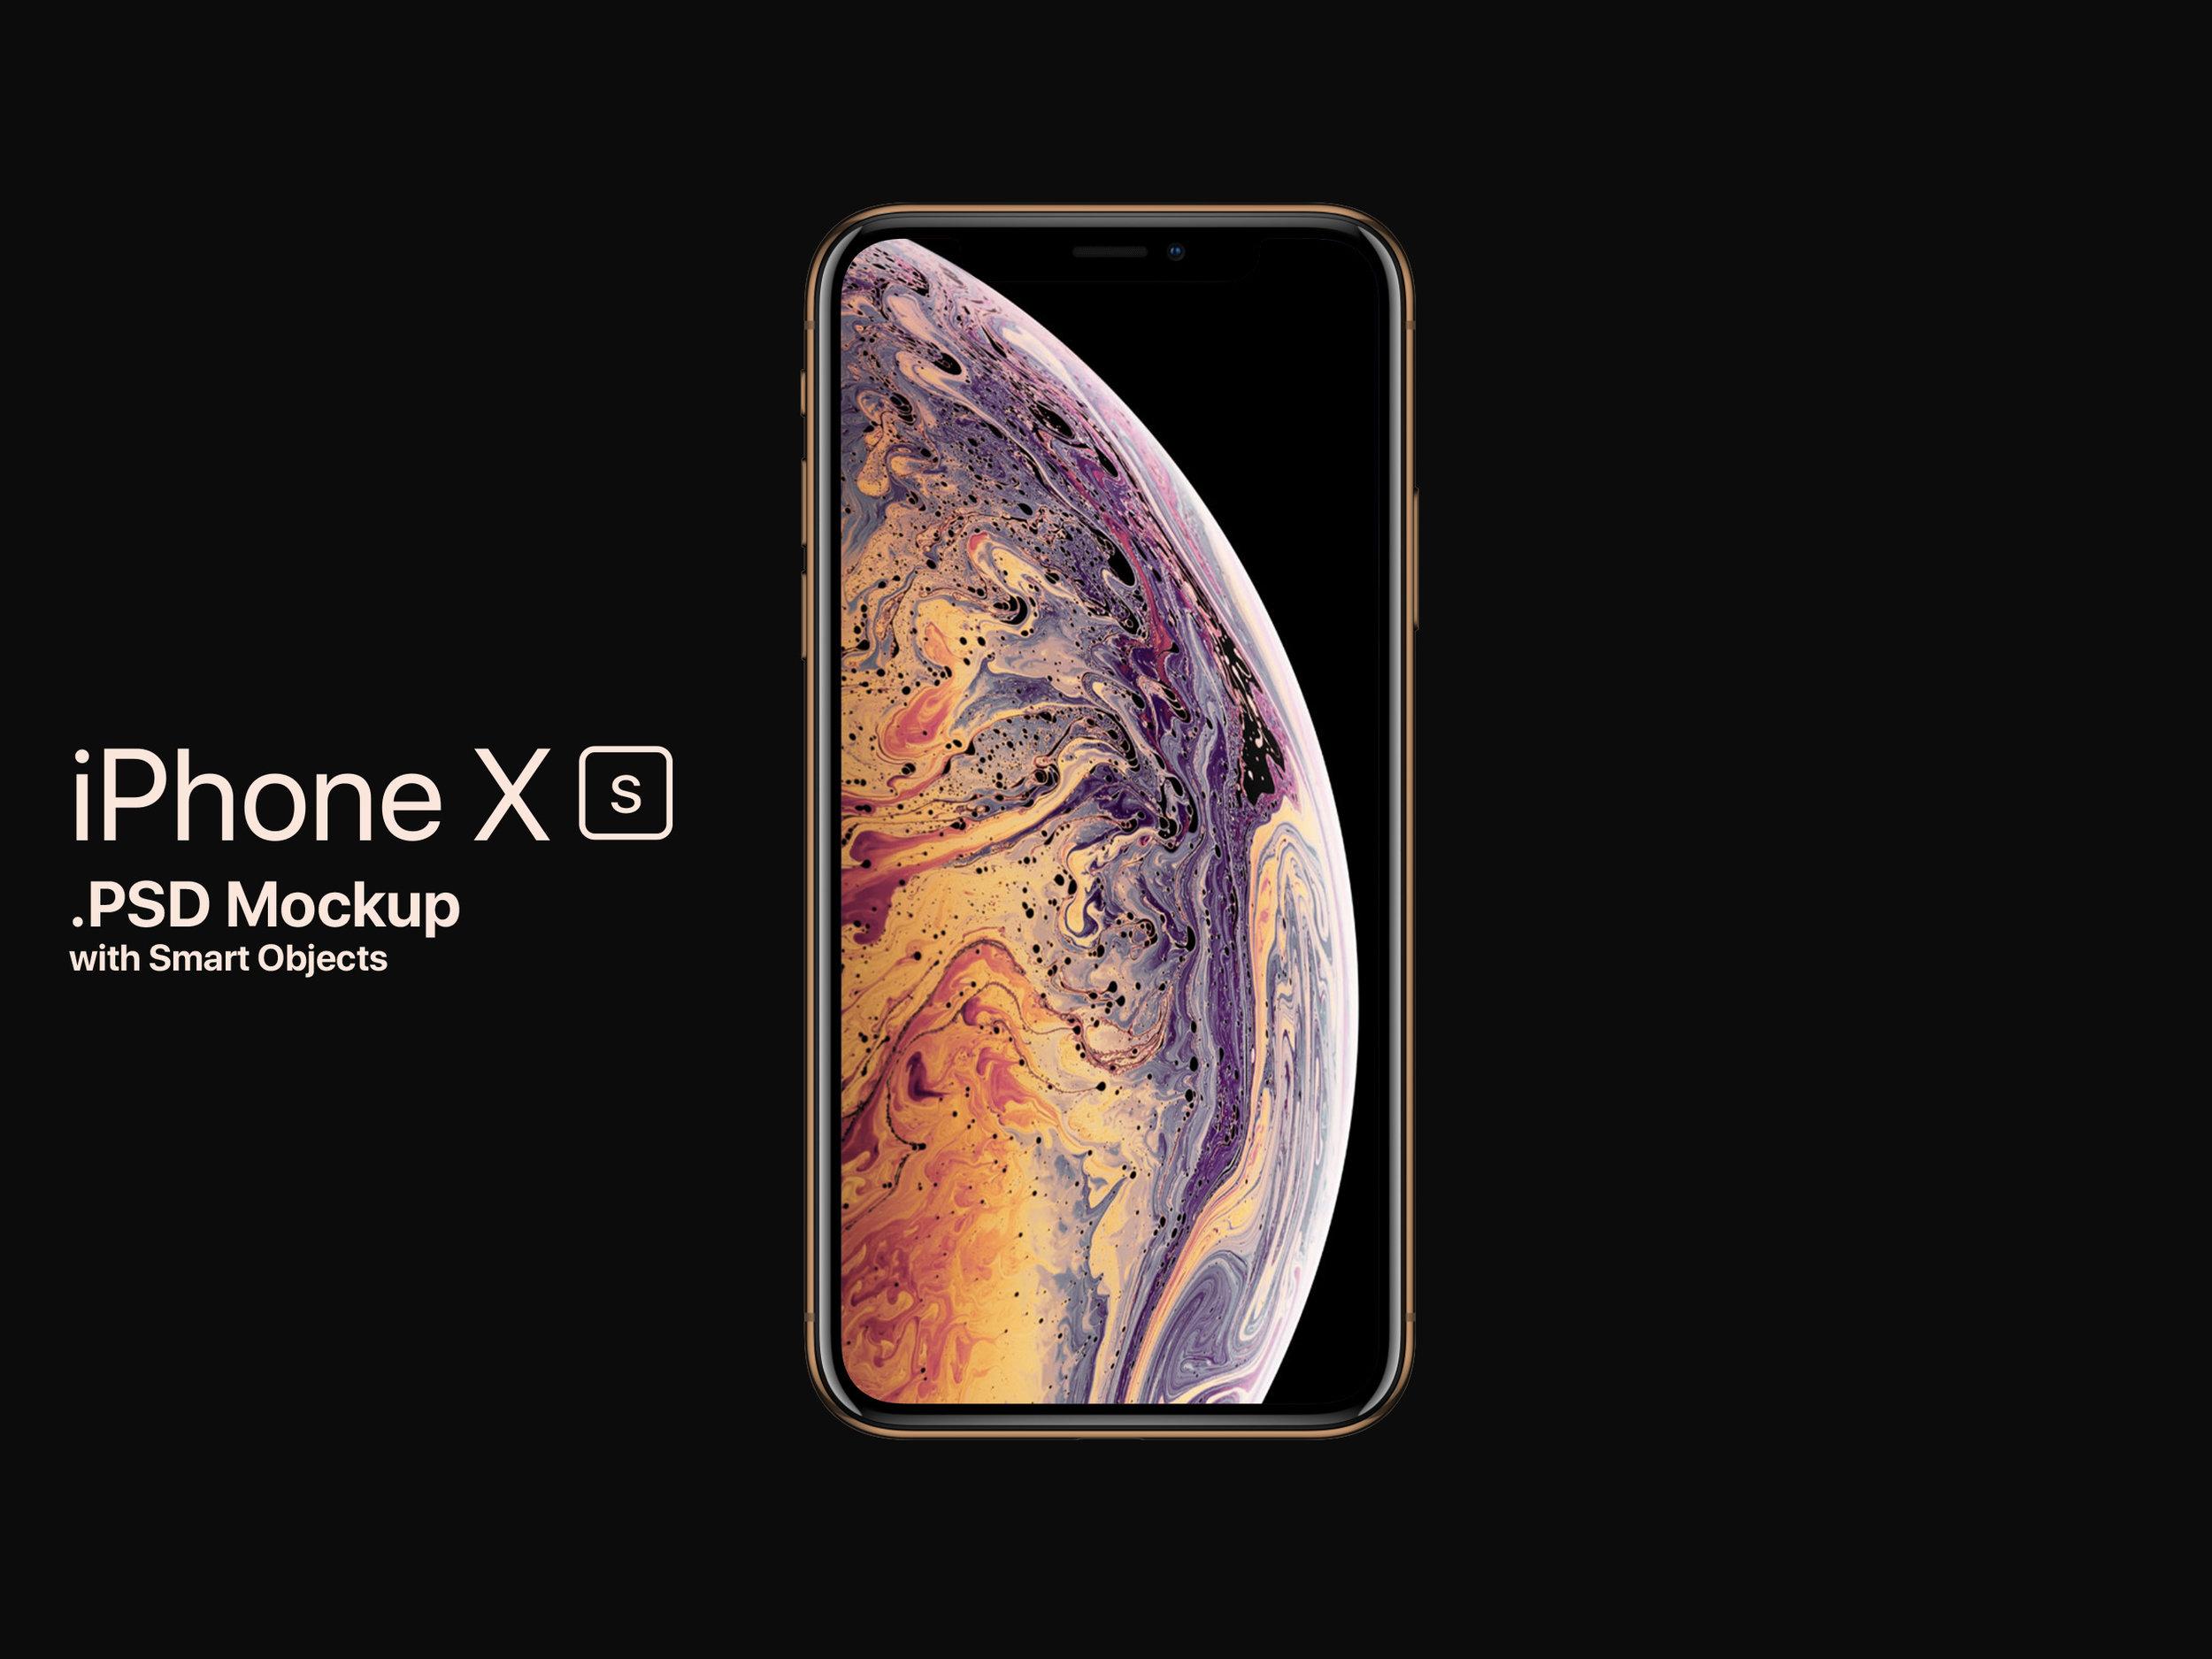 iPhoneXs_Mockup.jpg